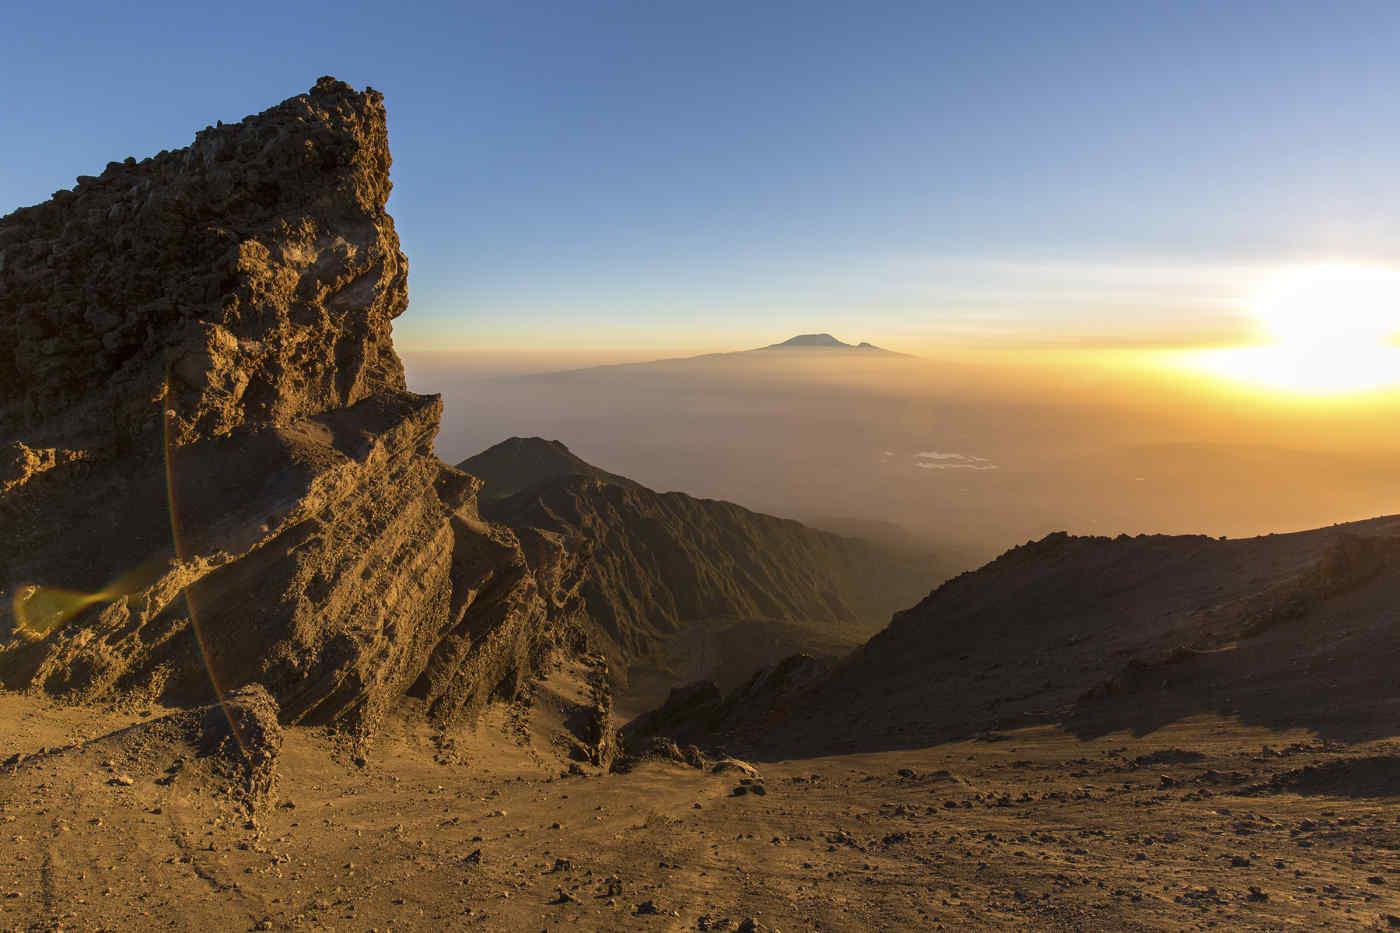 Mount Meru and Mount Kilimanjaro, Tanzania